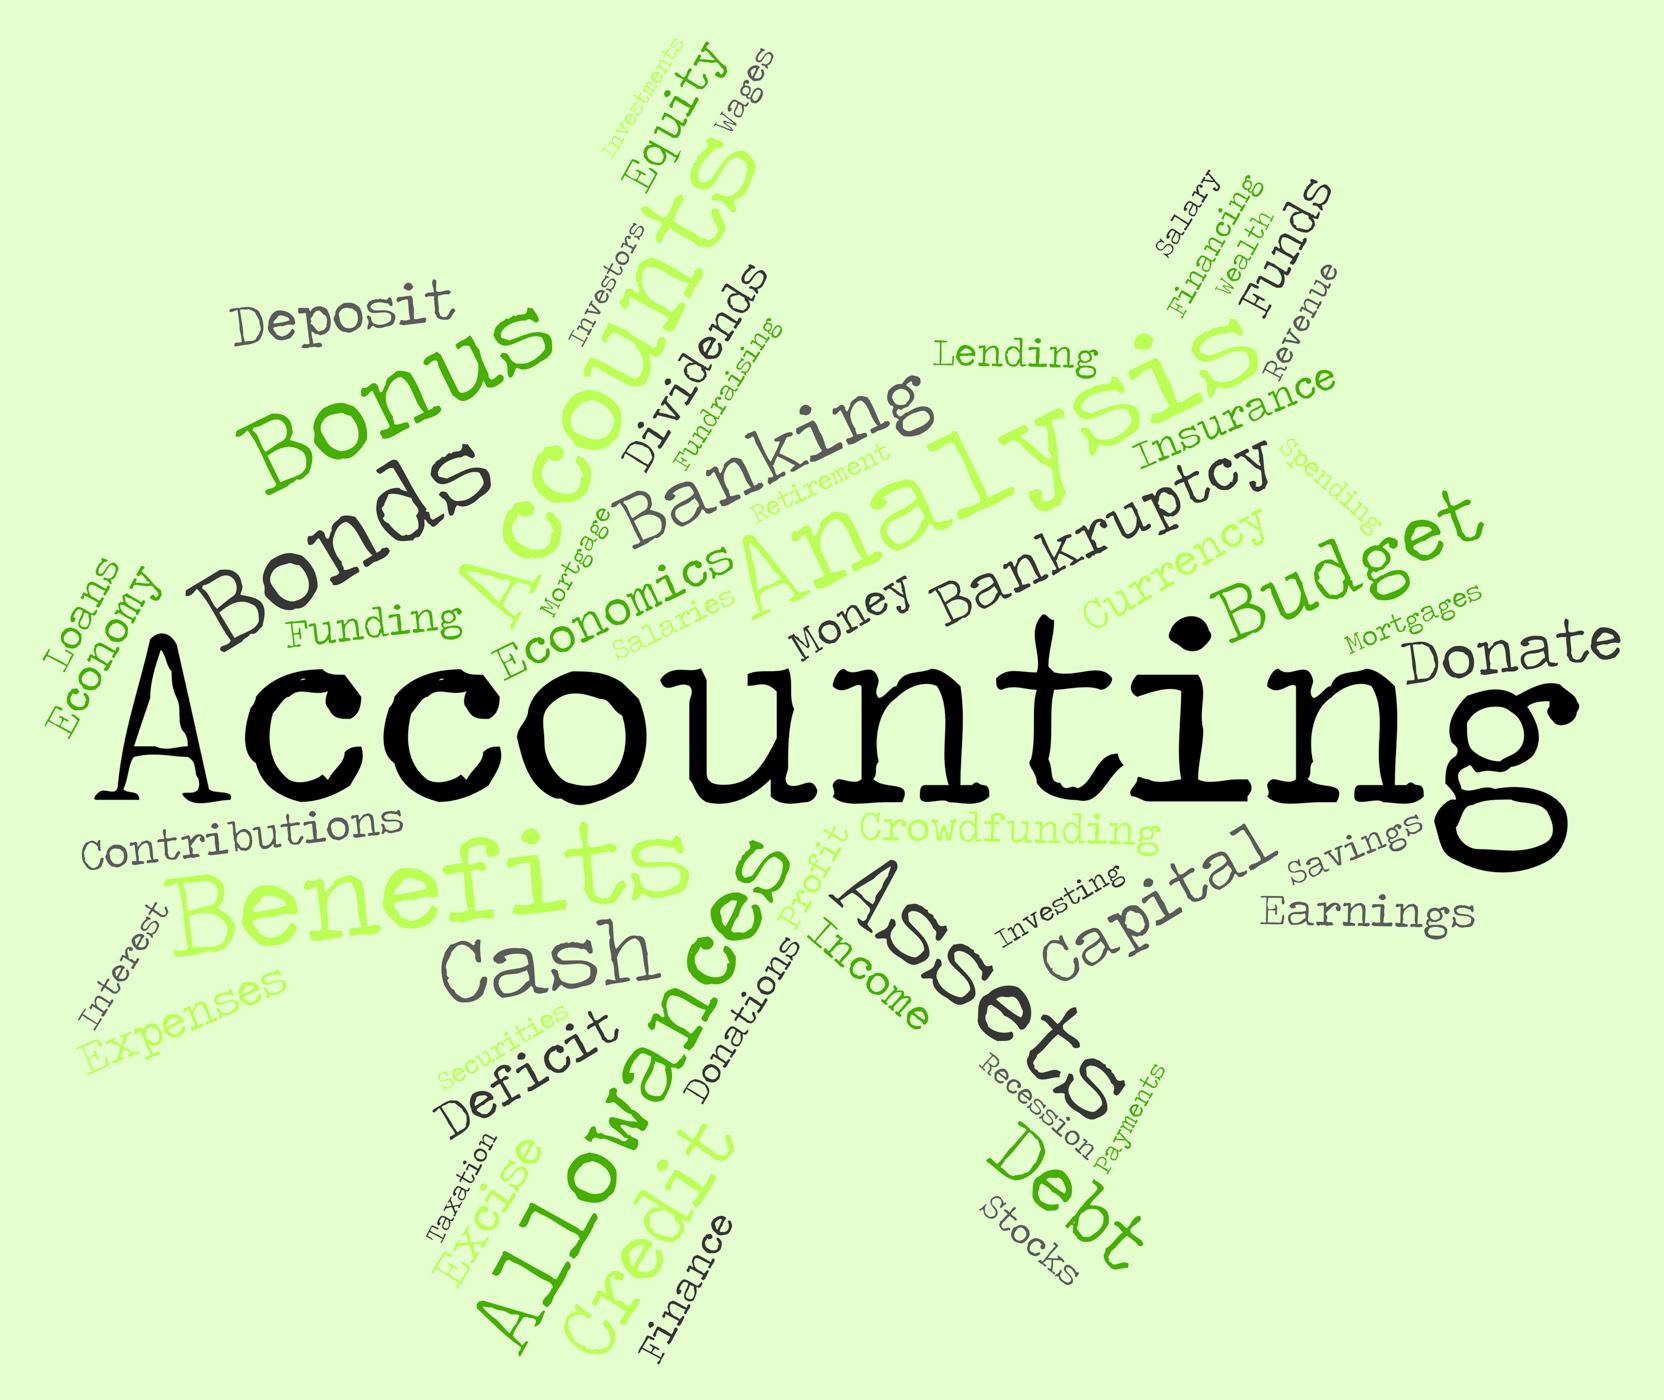 basic accounting terms in hindi